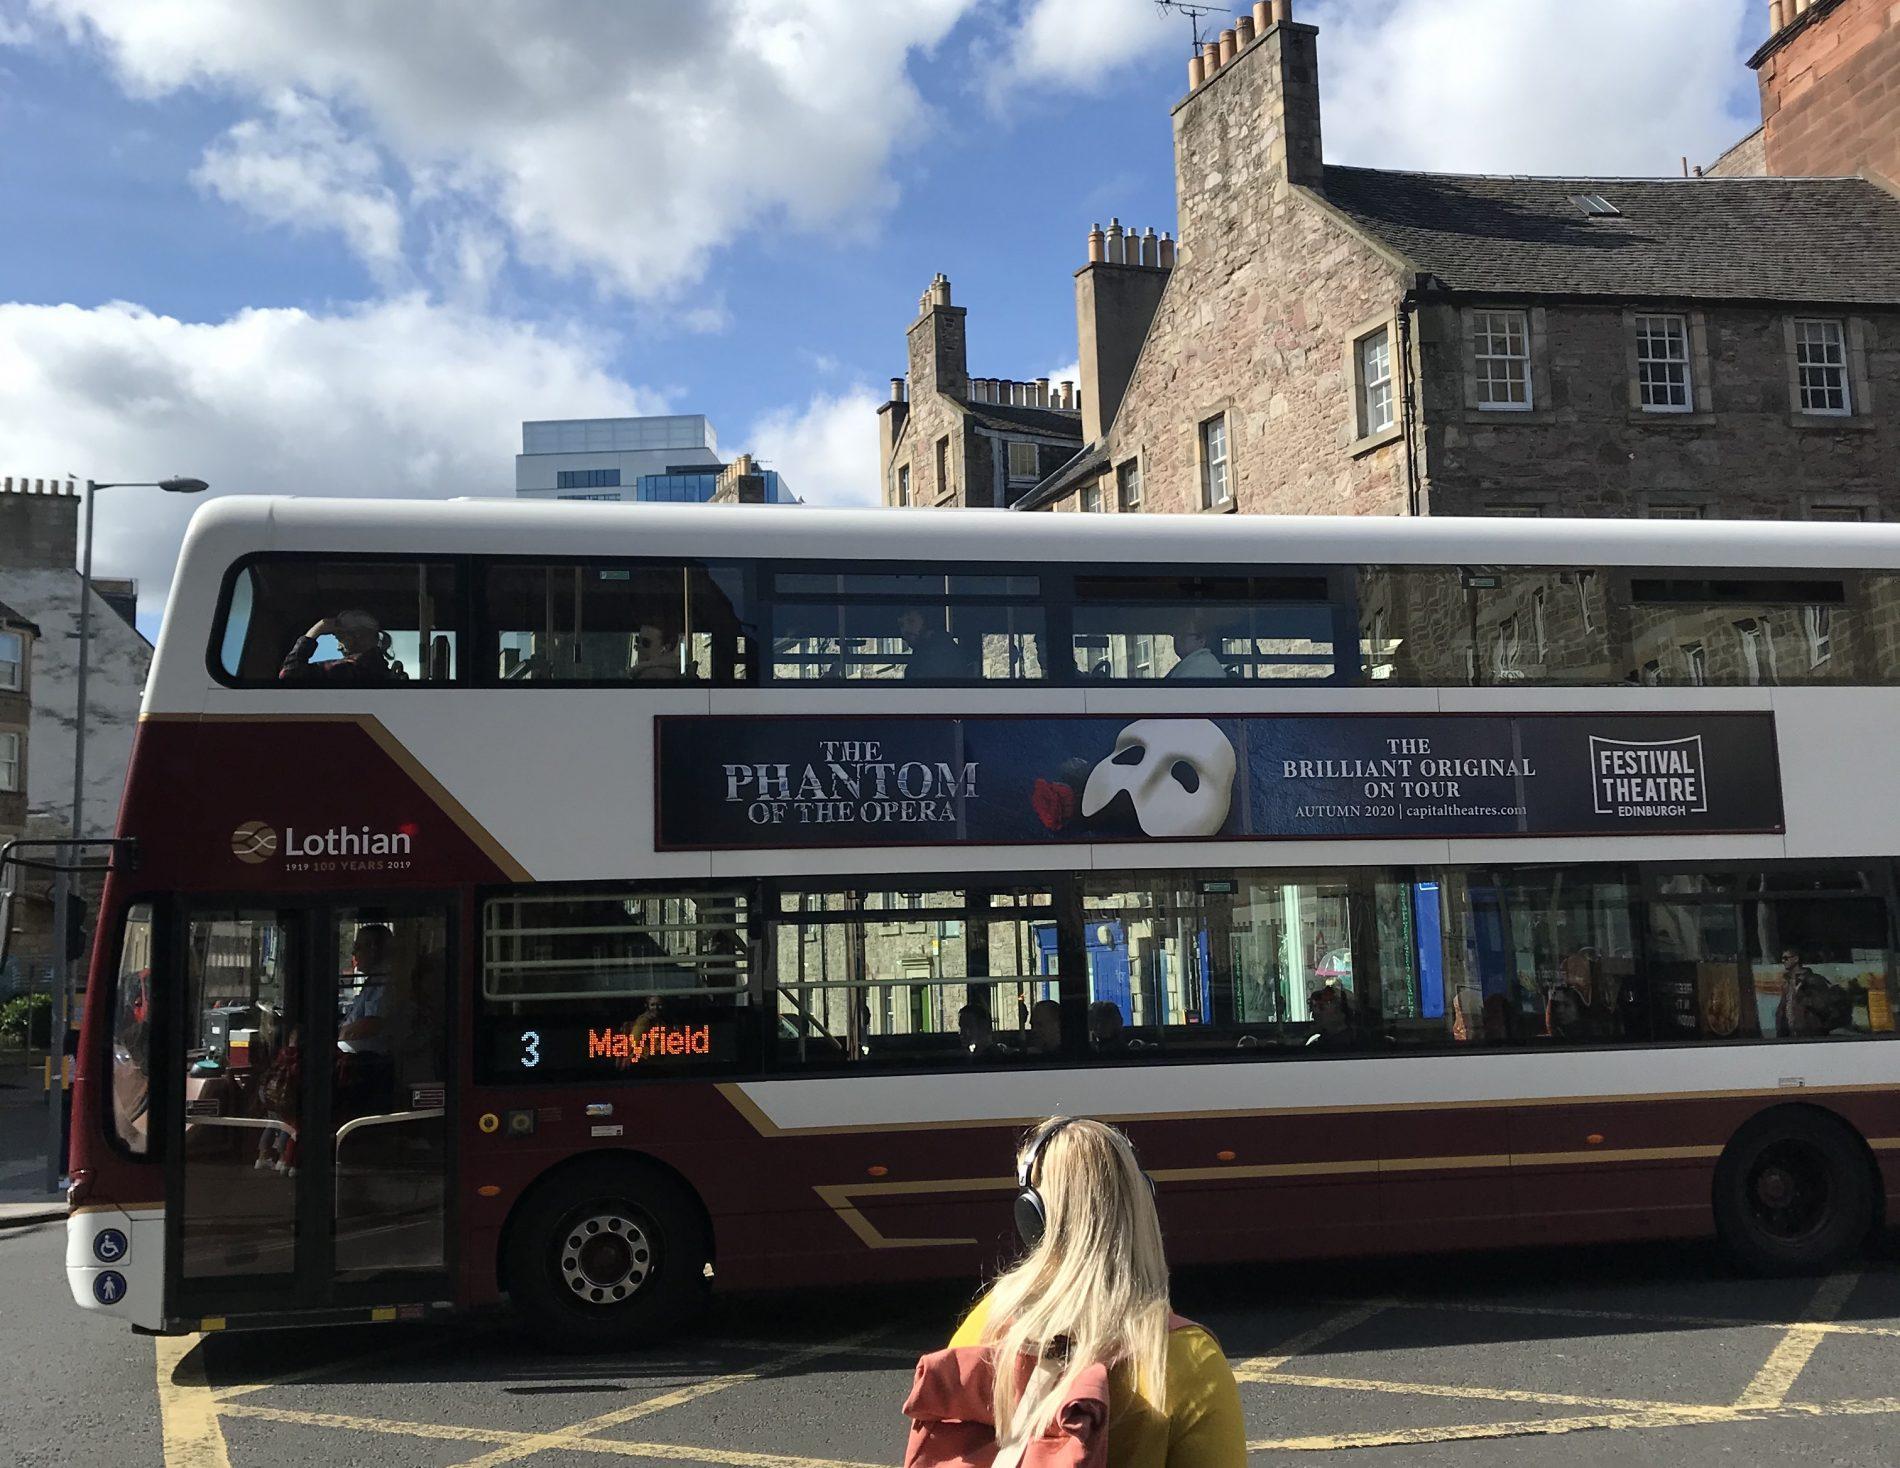 Edinburgh bus displaying Phantom of the Opera advert